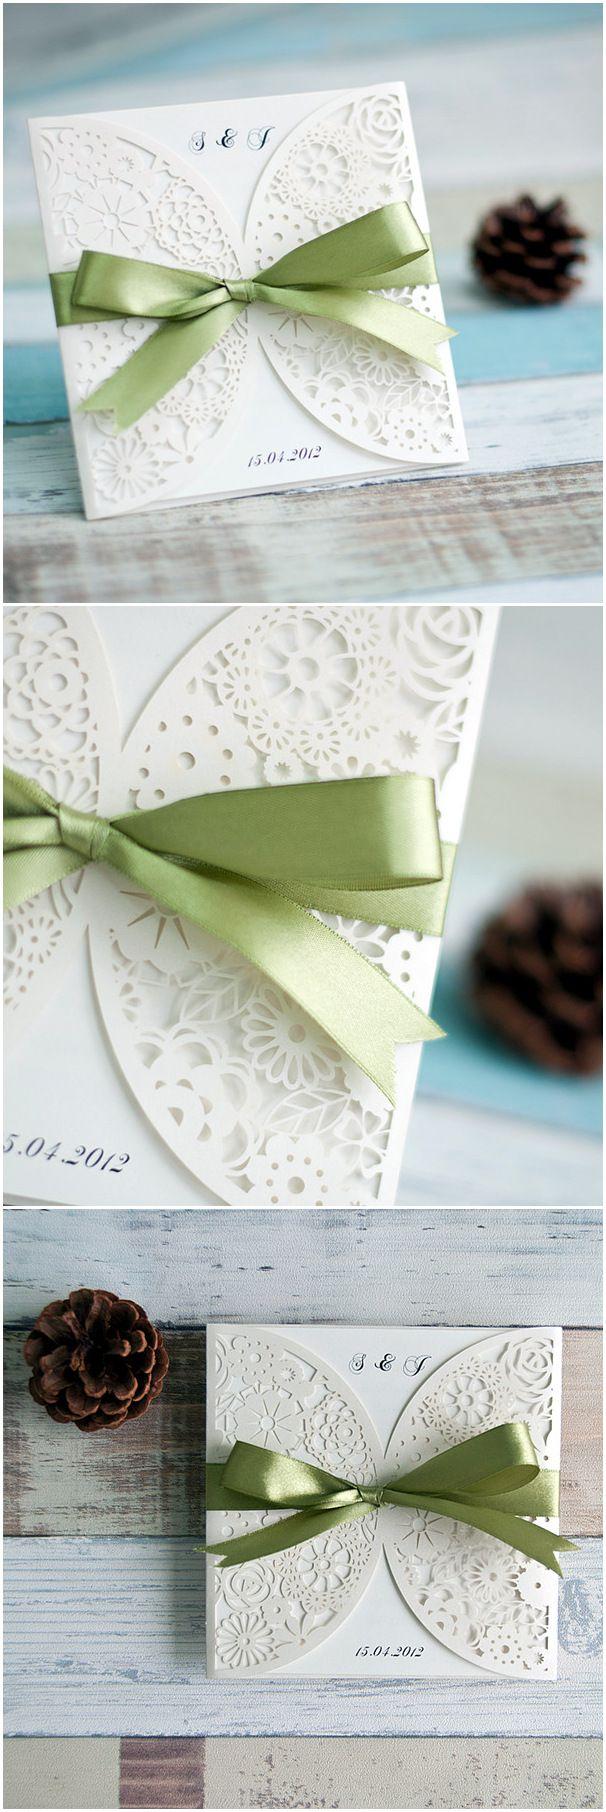 160 Best Laser Cut Wedding Invitations Images On Pinterest Laser